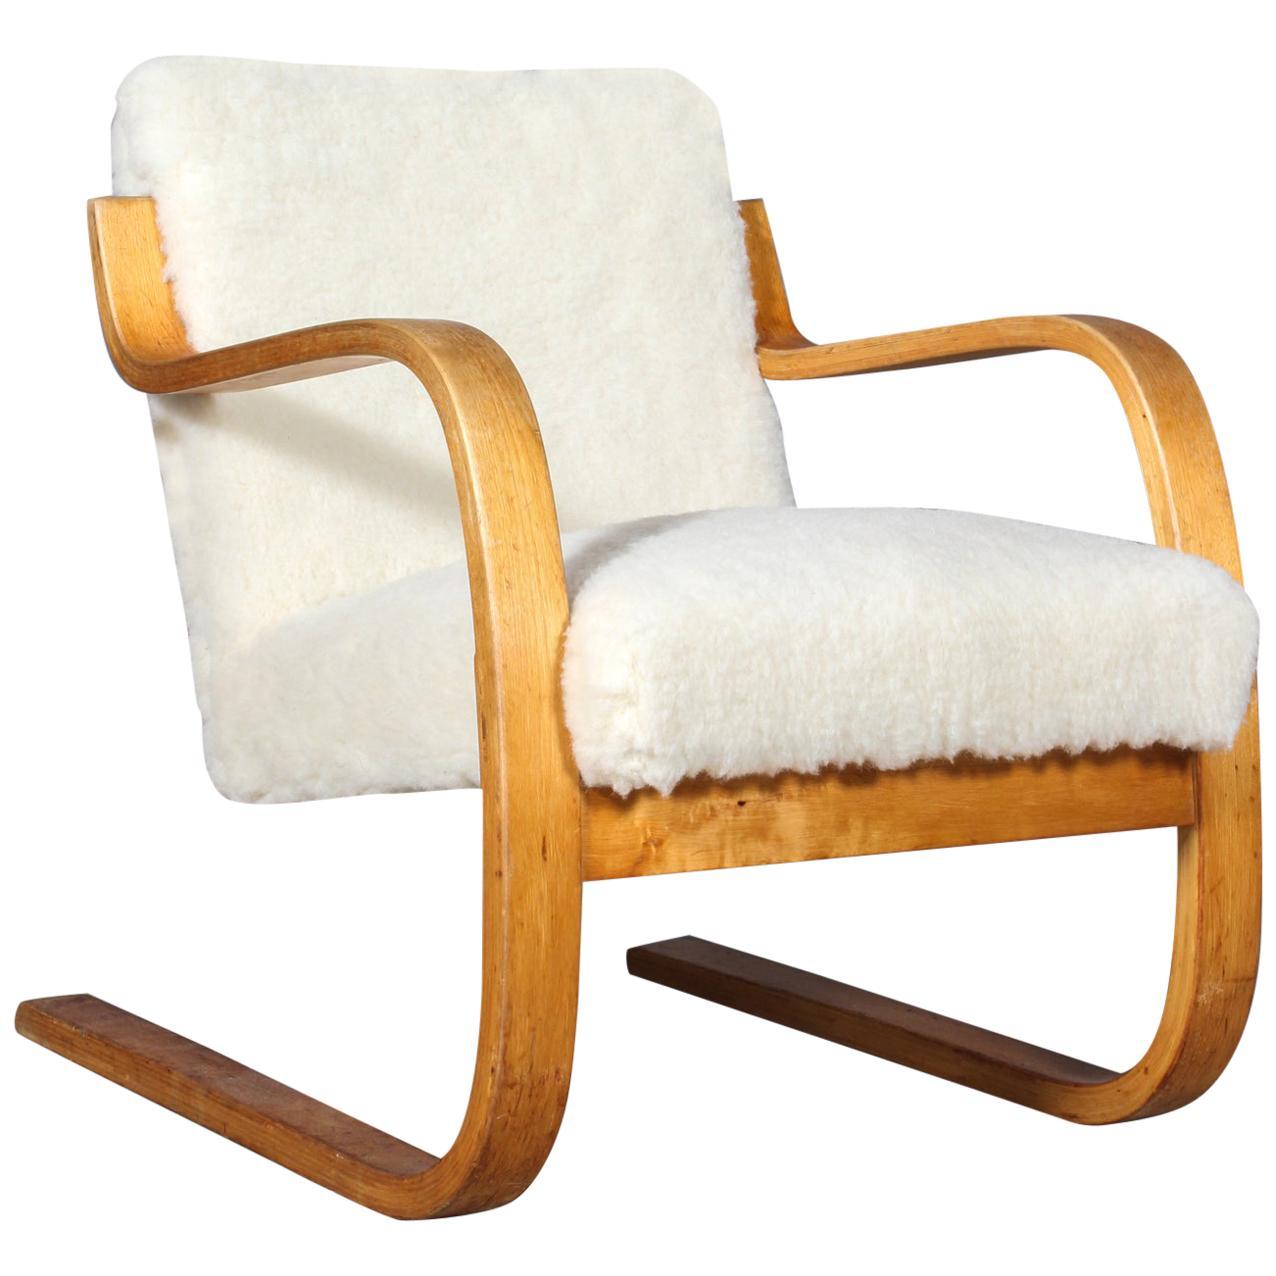 Alvar Aalto 402 Series Armchair for Artek, circa 1960, Sheepwool